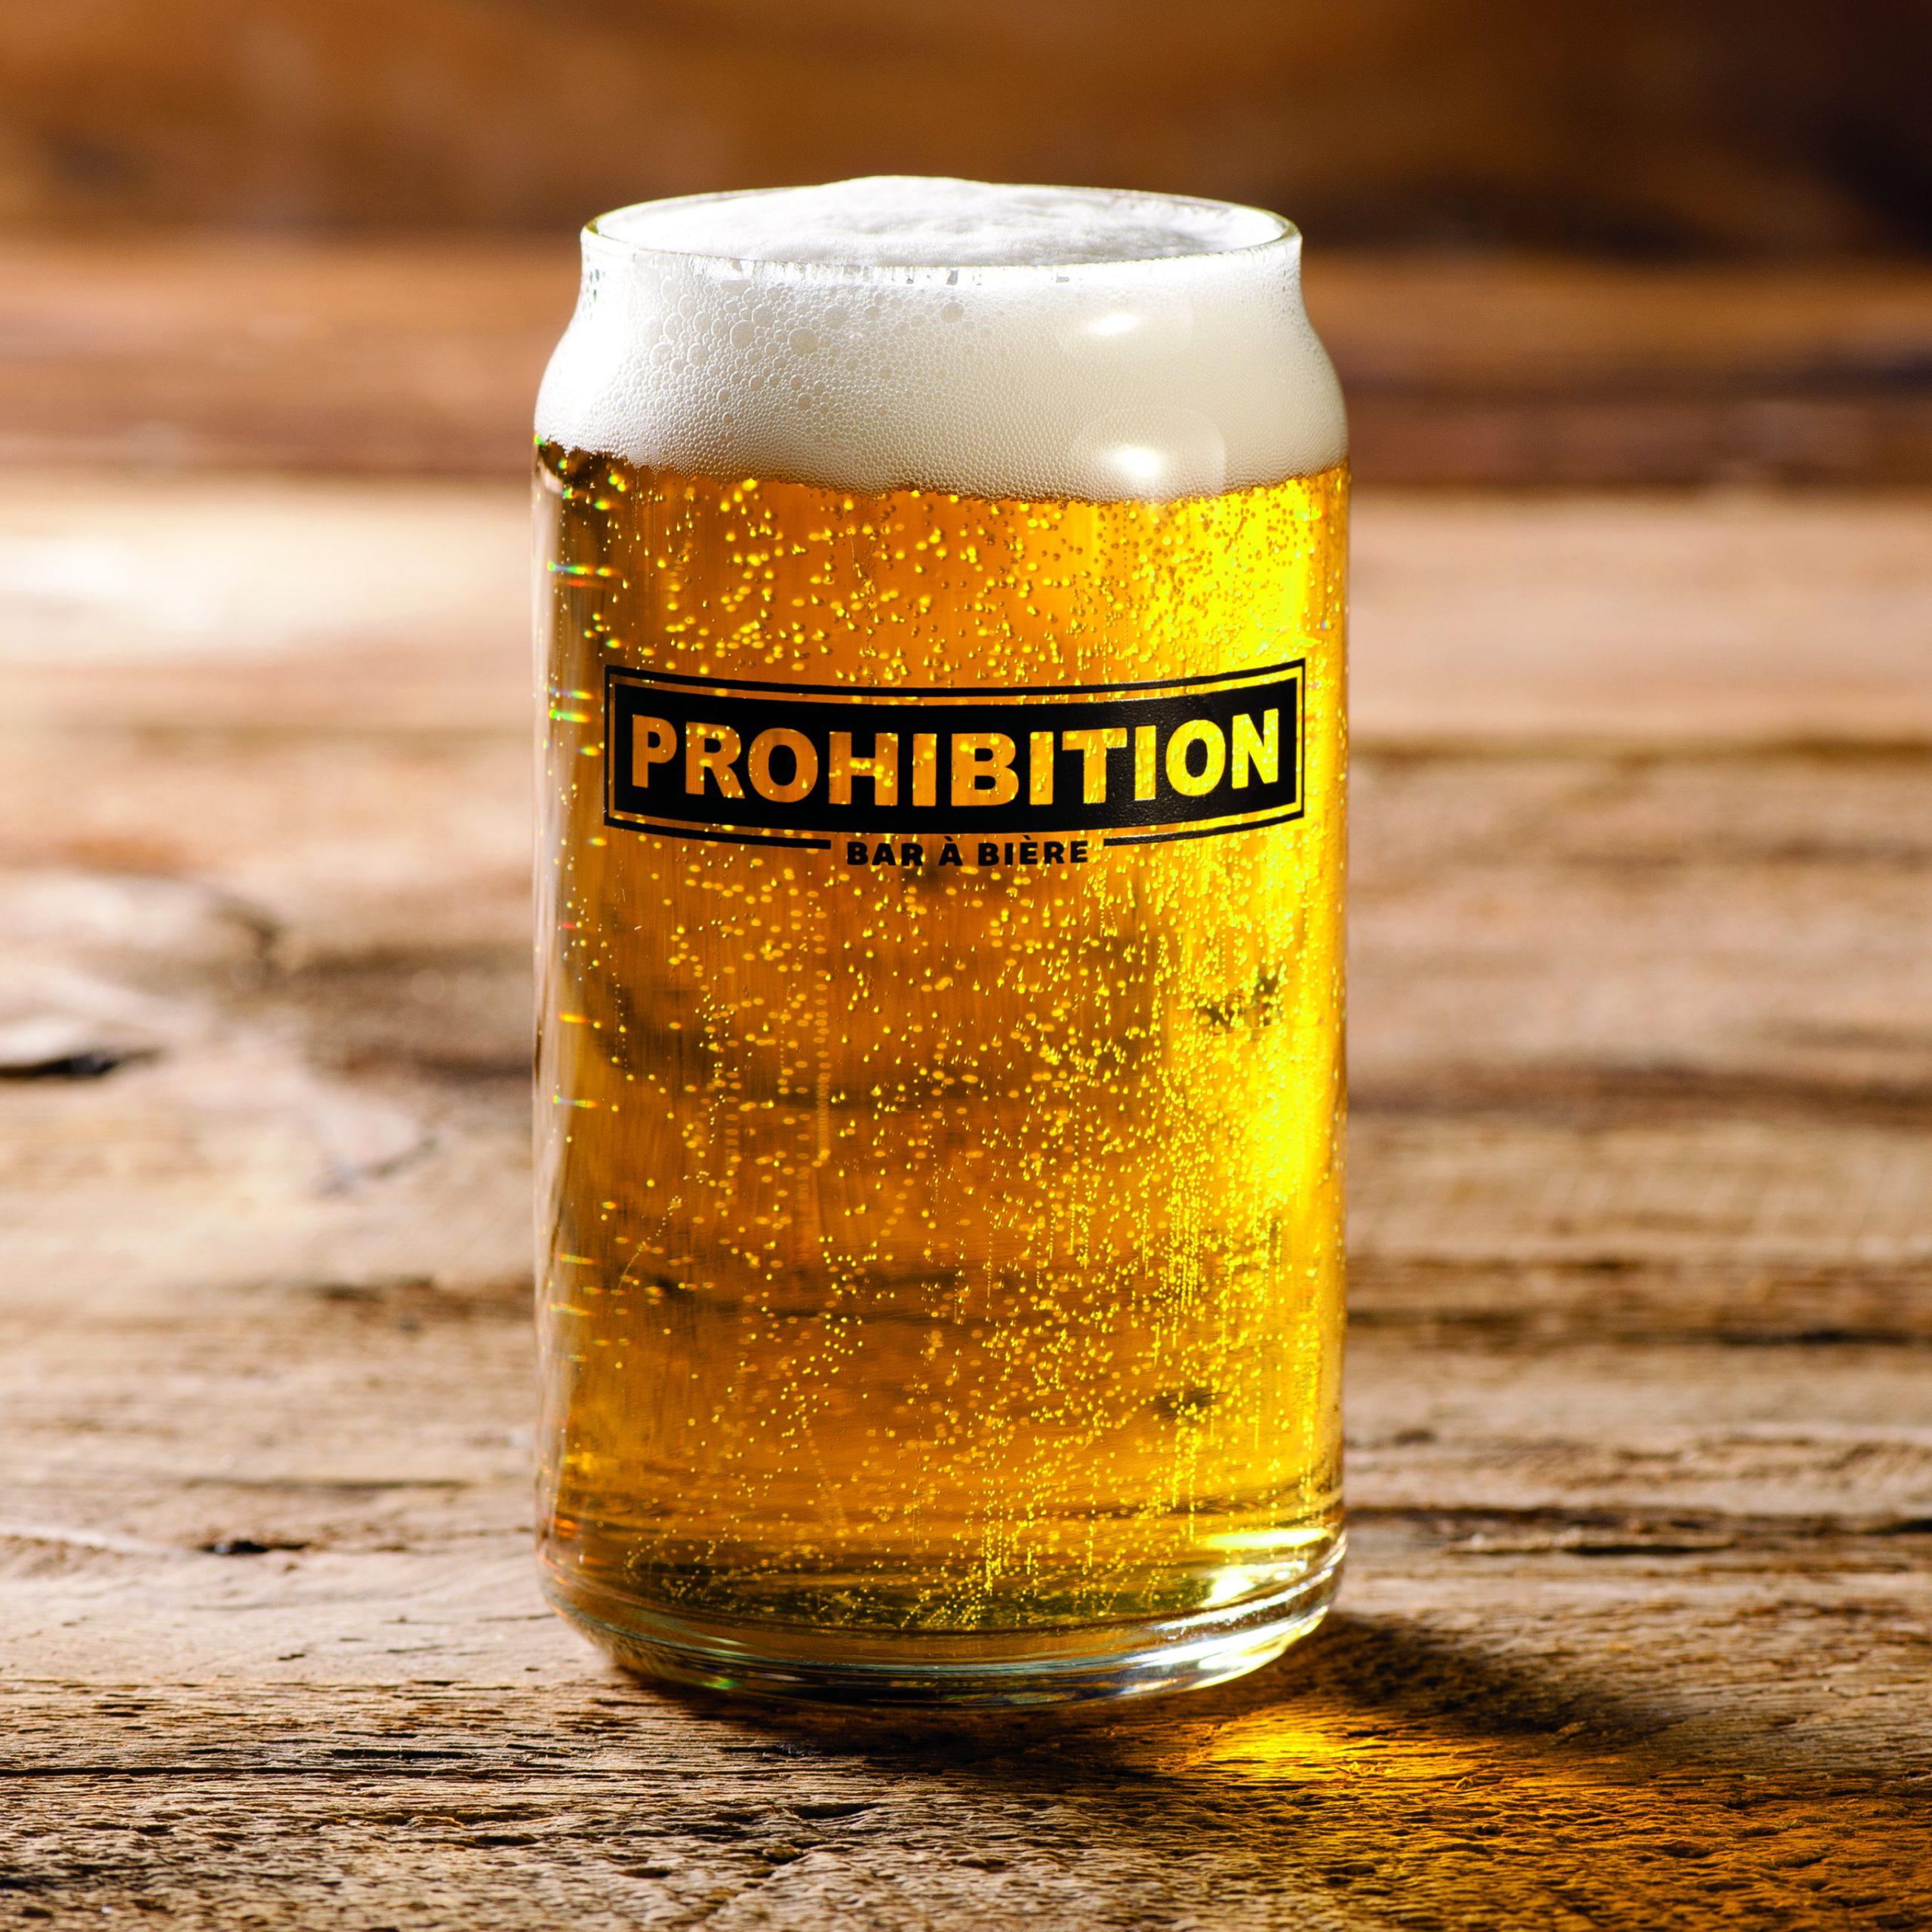 001 Prohibition Highres Cmyk 2